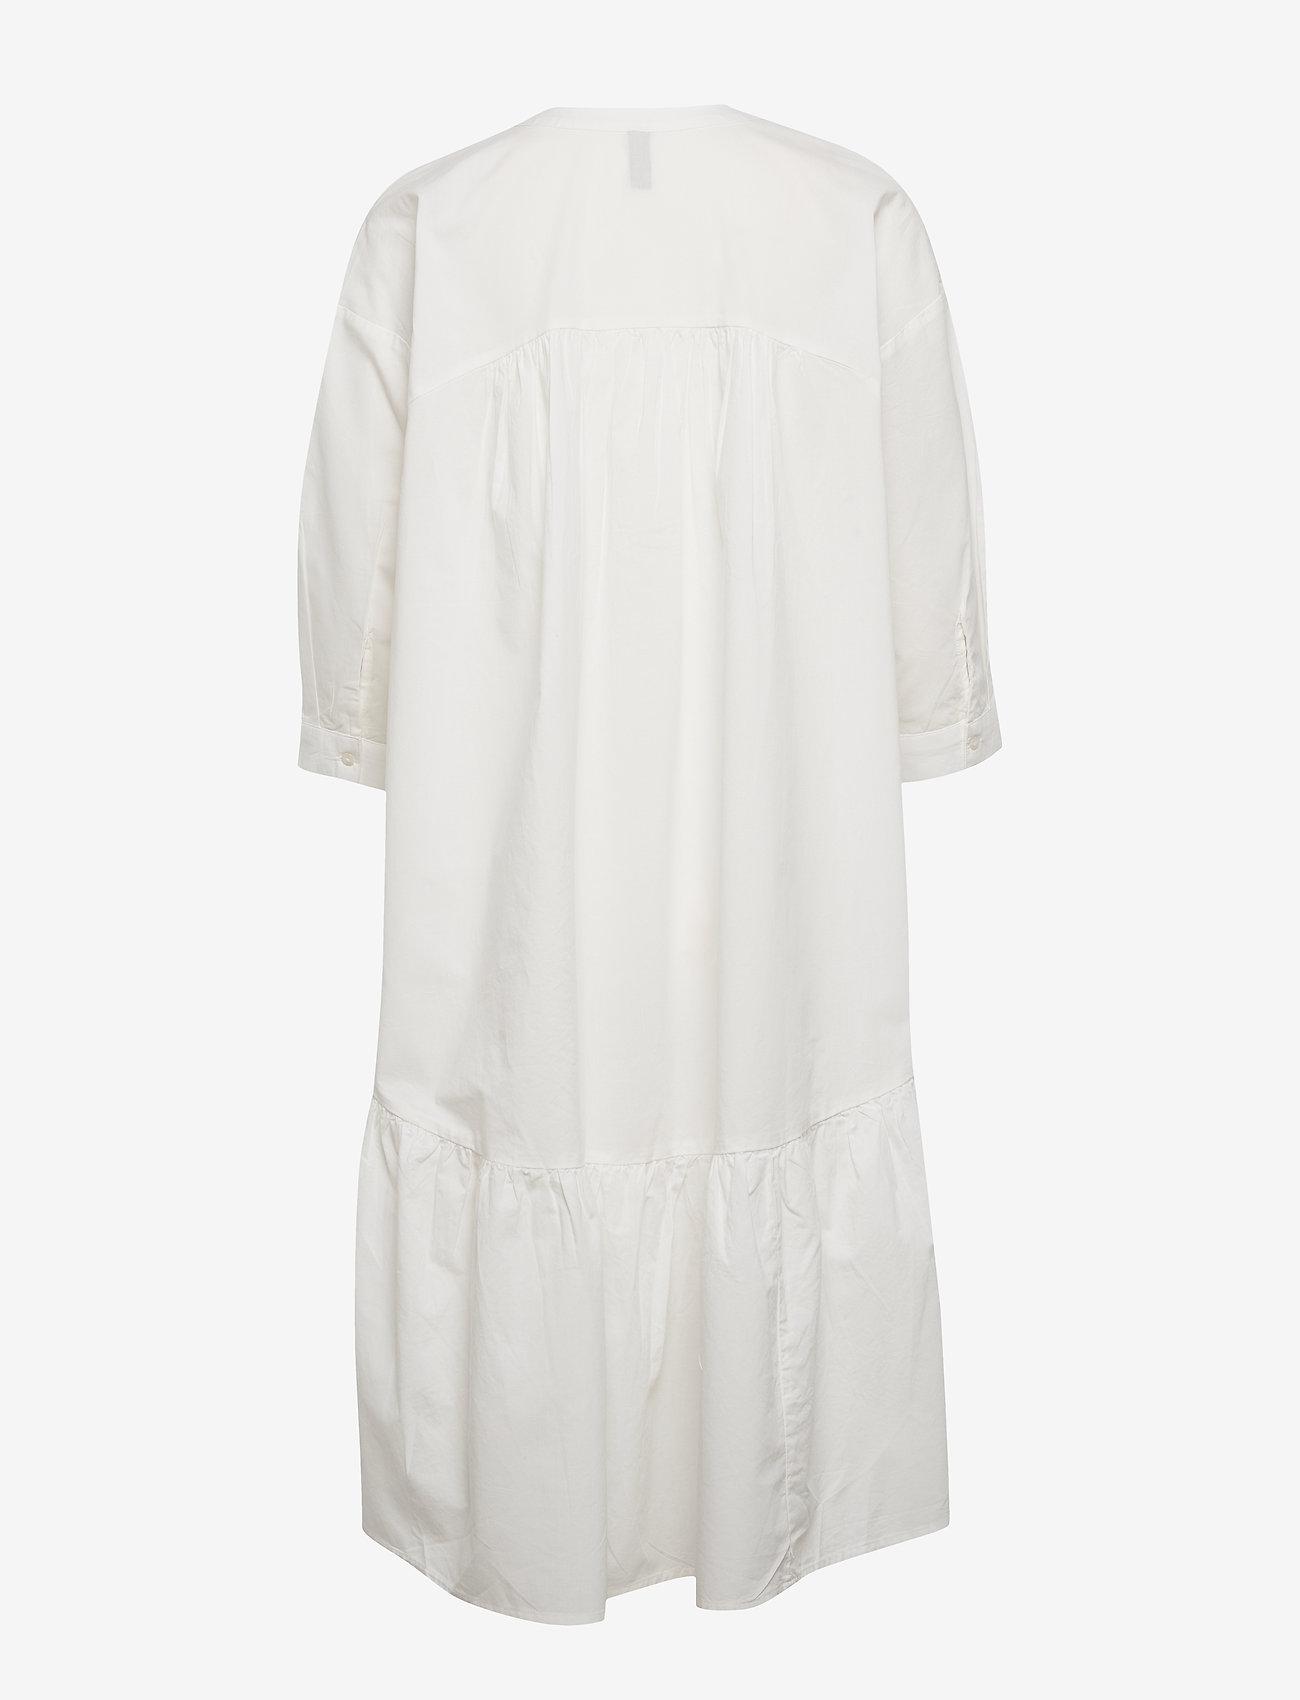 Yas Yasmerian 3/4 Dress - Icons S. Dresses